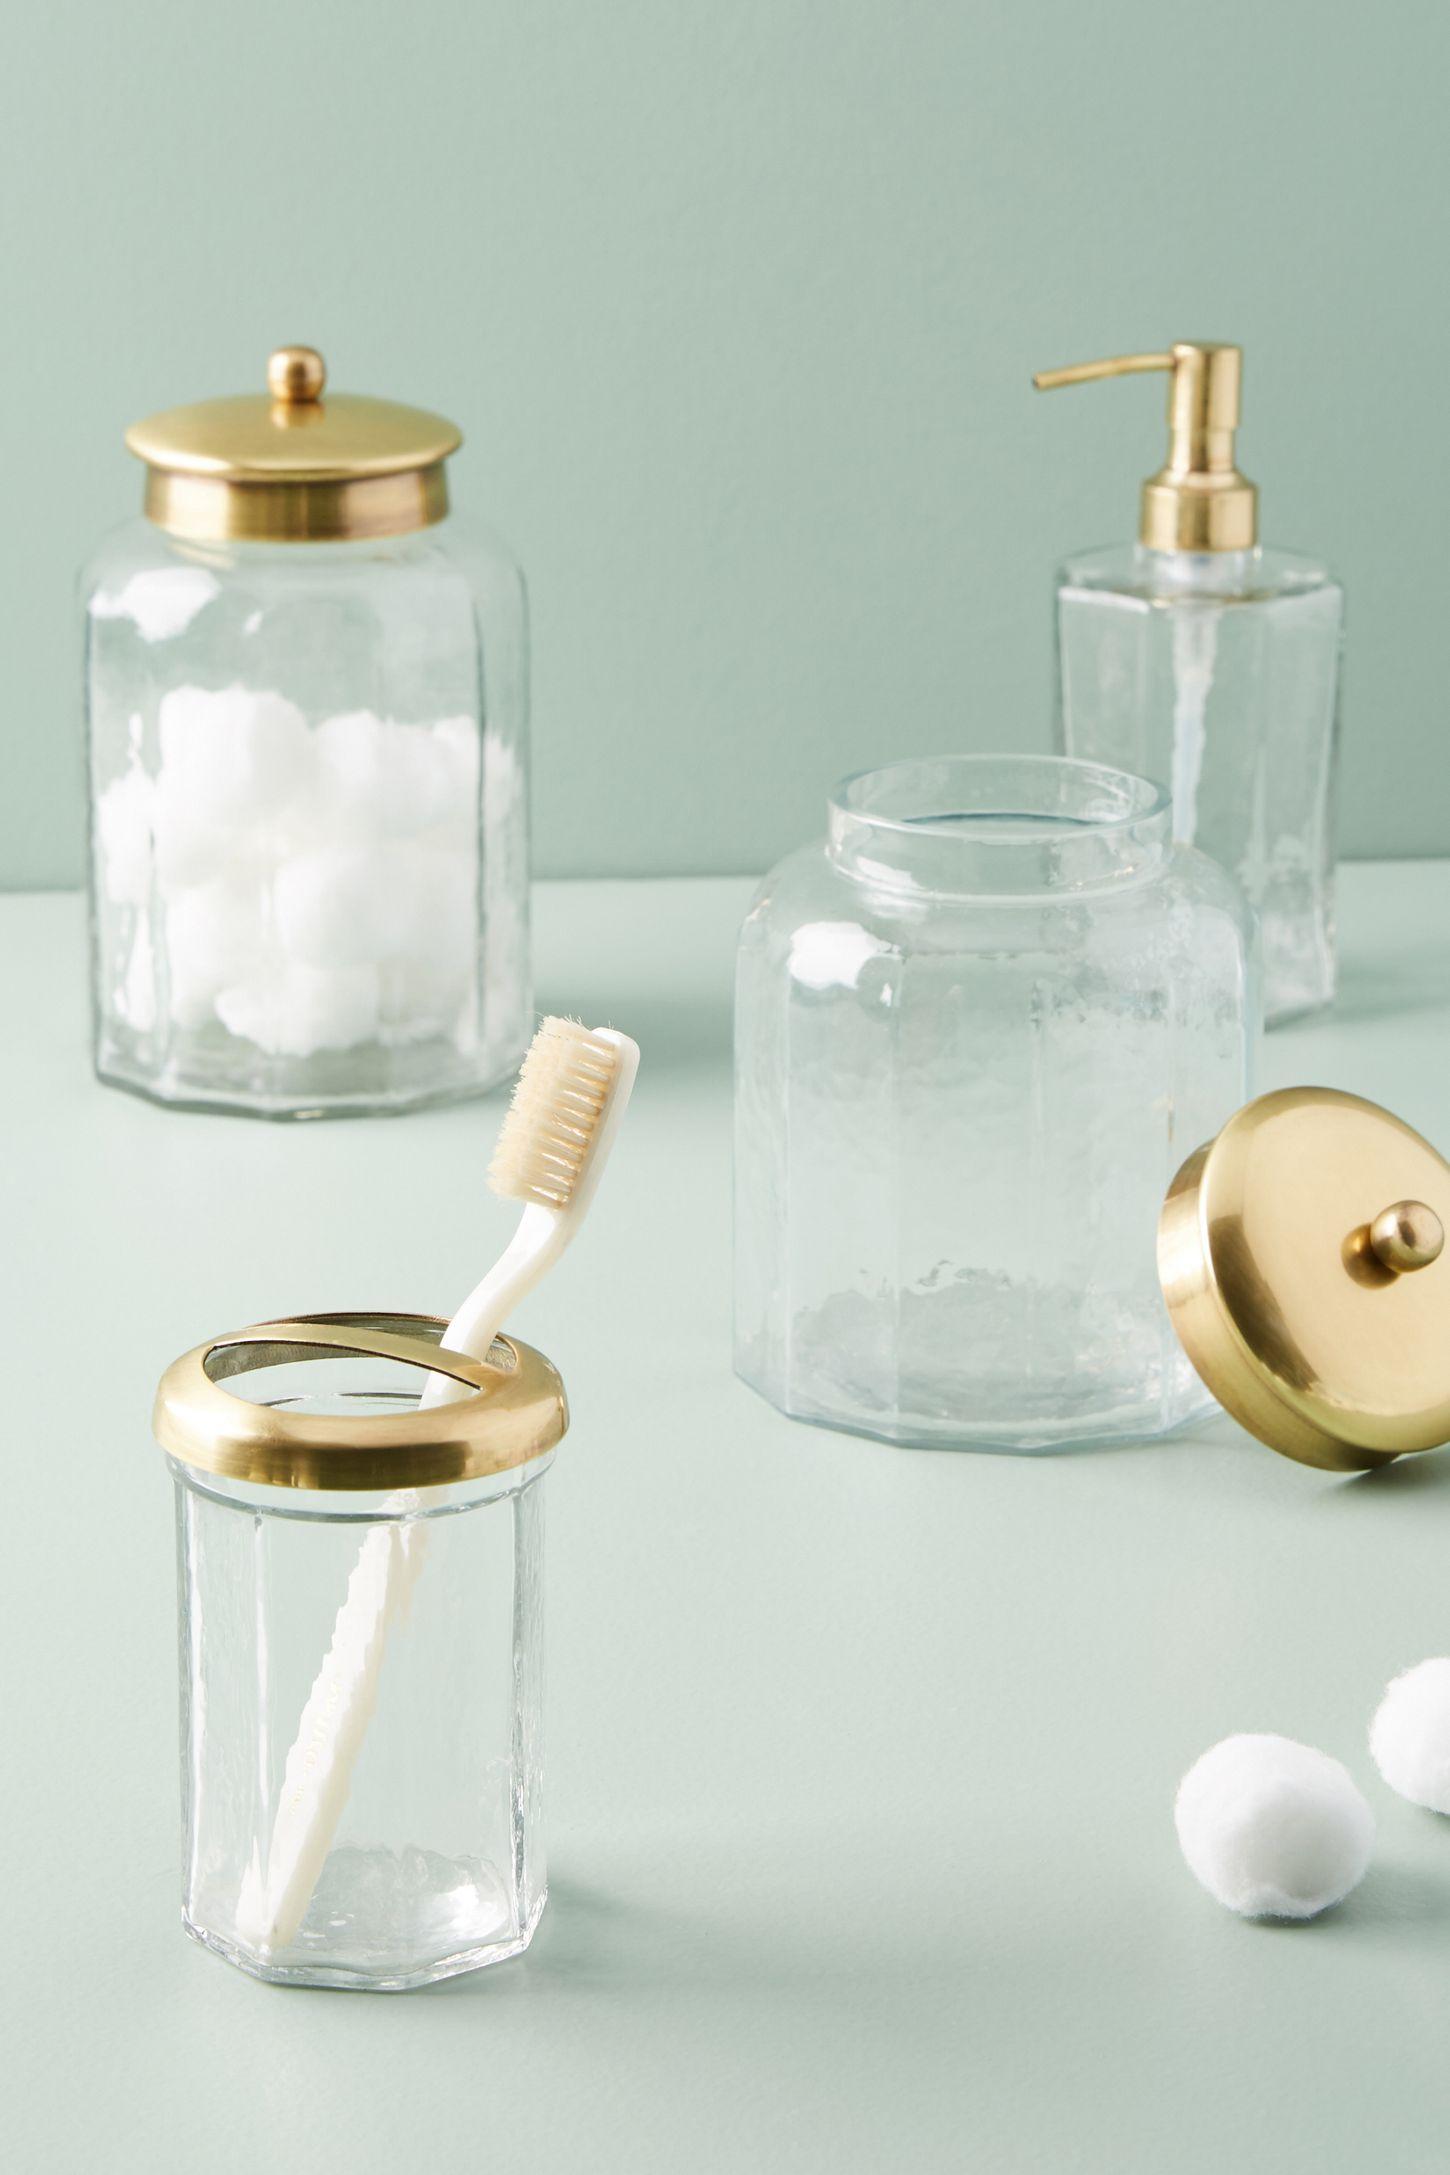 accessoires de salle de bain en verre doré | anthropologie french canada